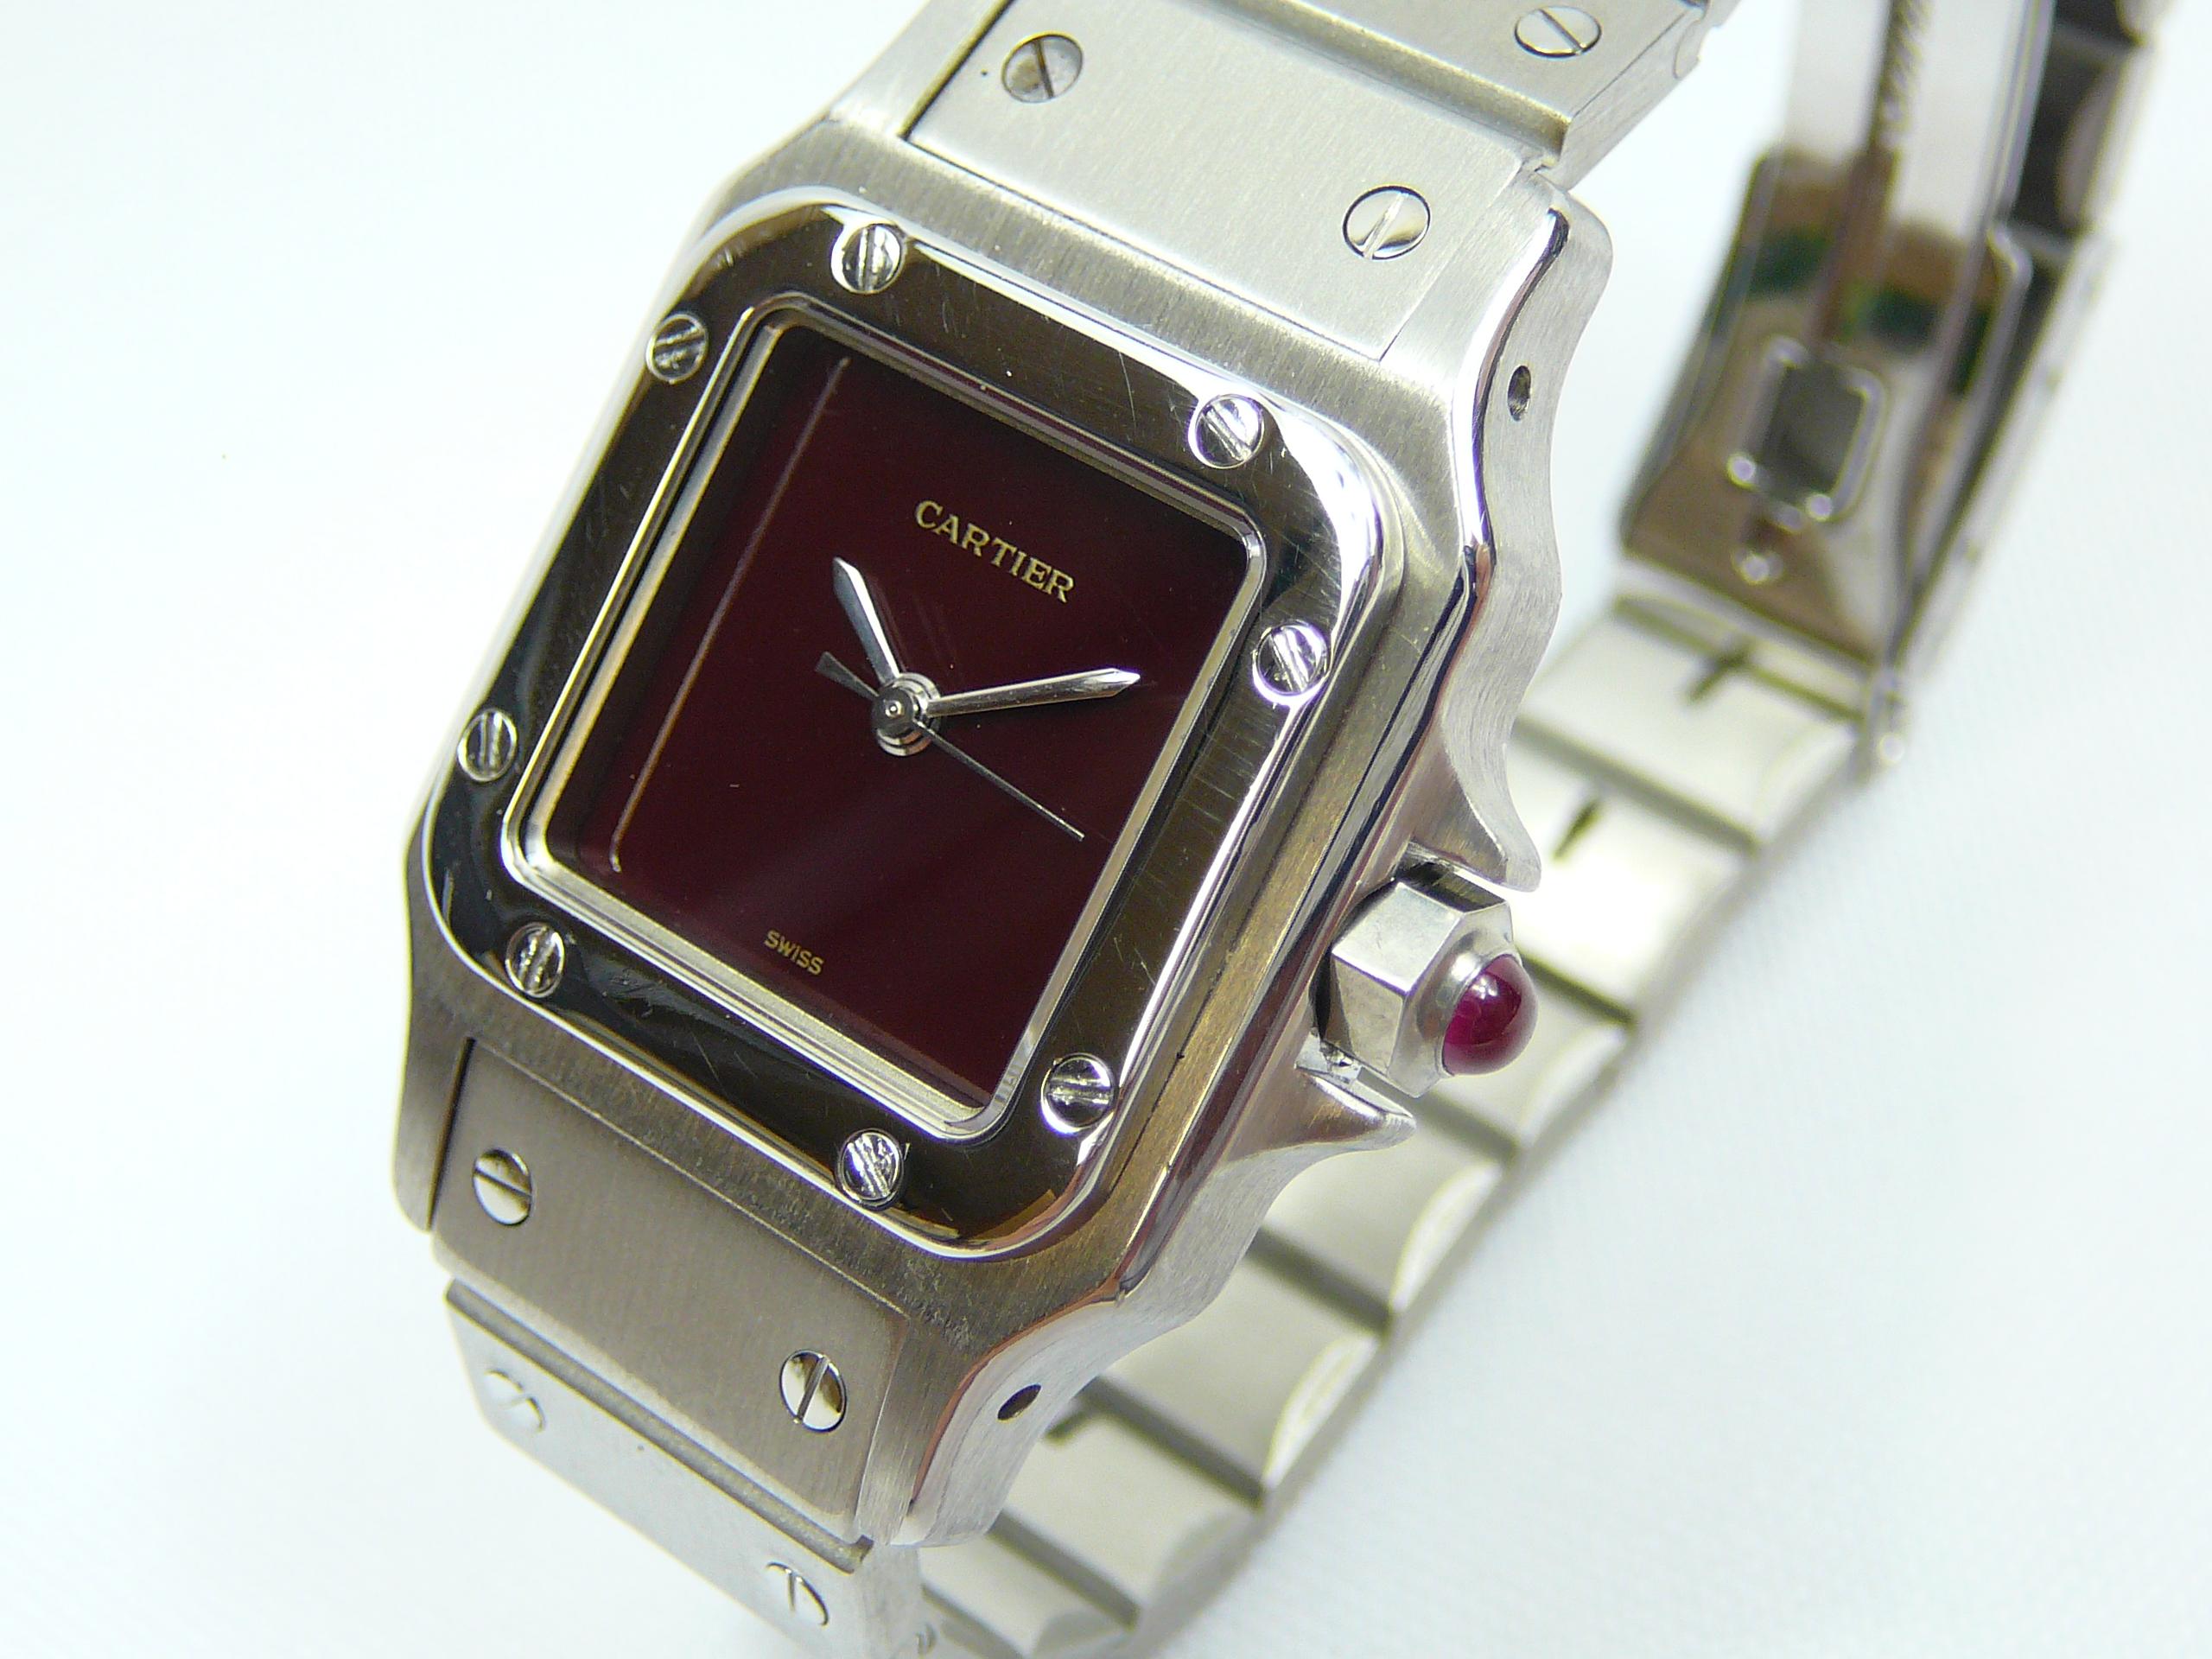 Ladies Cartier Wrist Watch - Image 2 of 3